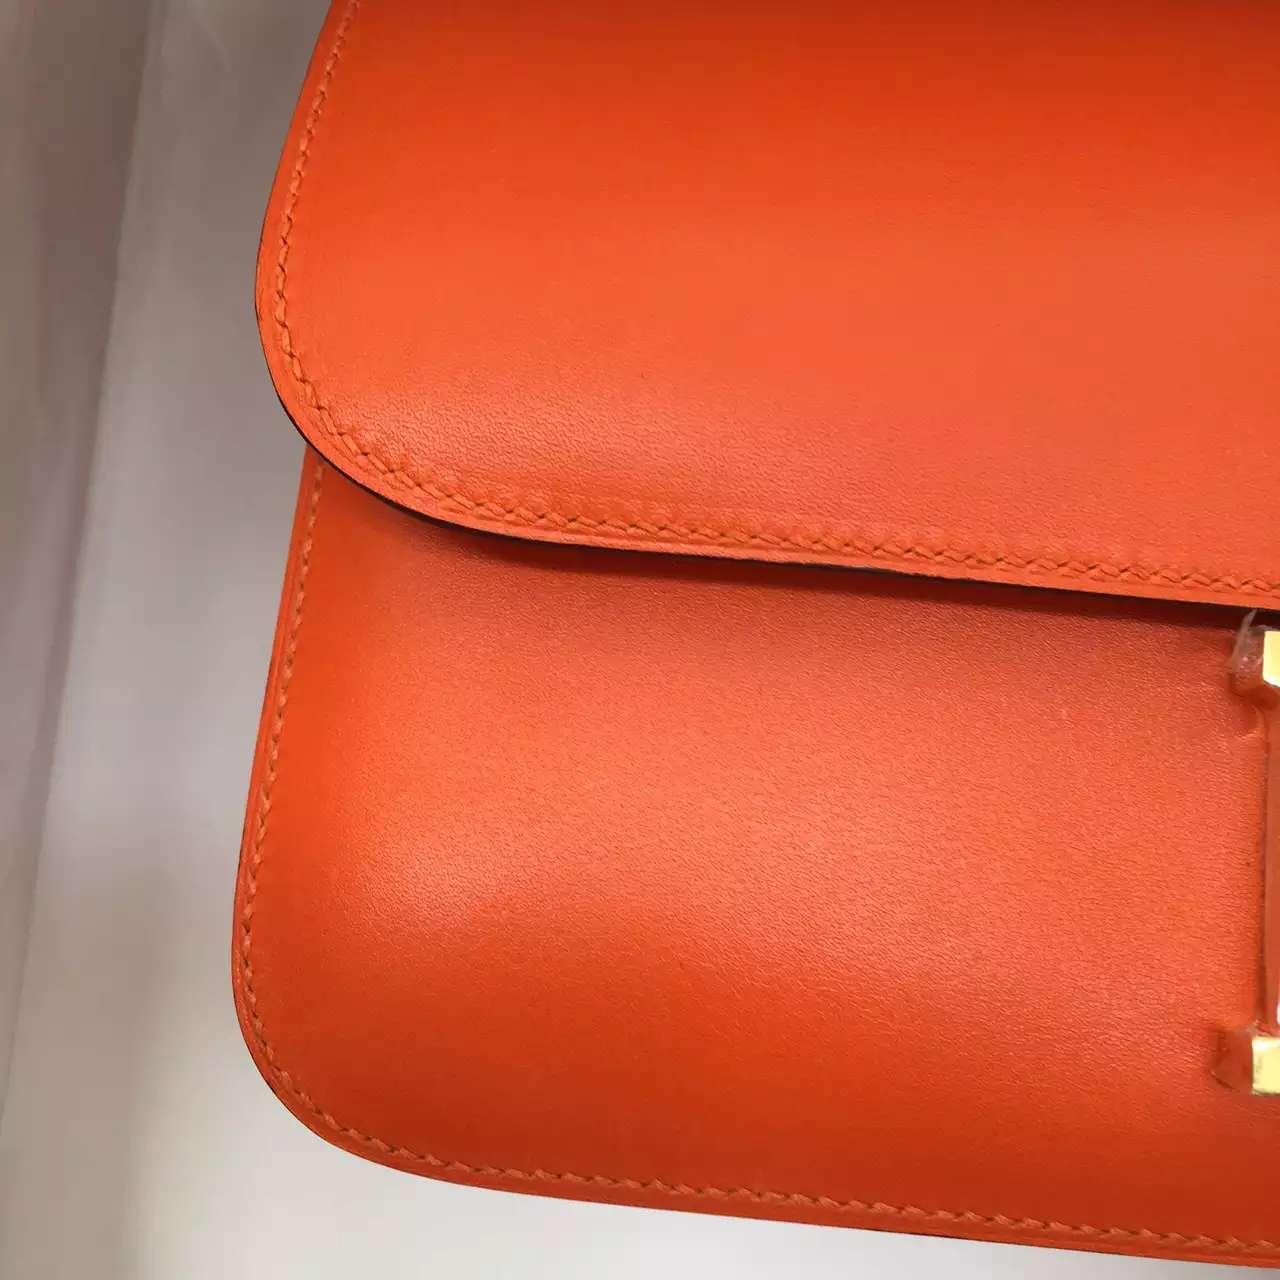 New Fashion Hermes Orange Swift Leather Constance Bag Ladies' Cross-body Bag 26CM